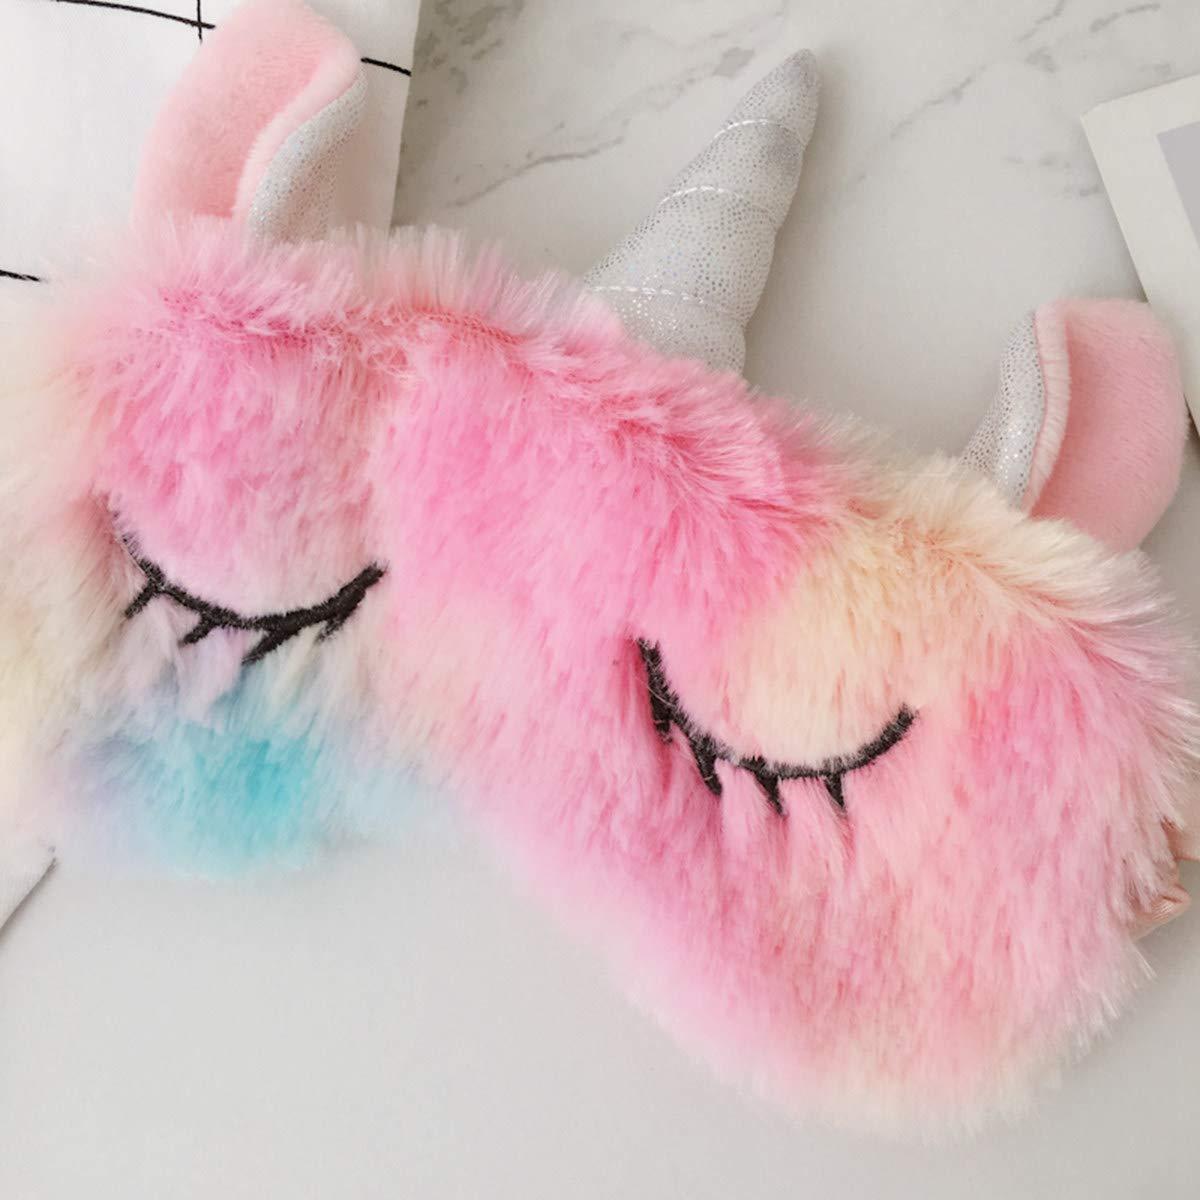 Monai Cute 3D Sleep Mask Plush Animal Sleeping Home Eye Cover for Women Girls (Unicorn)